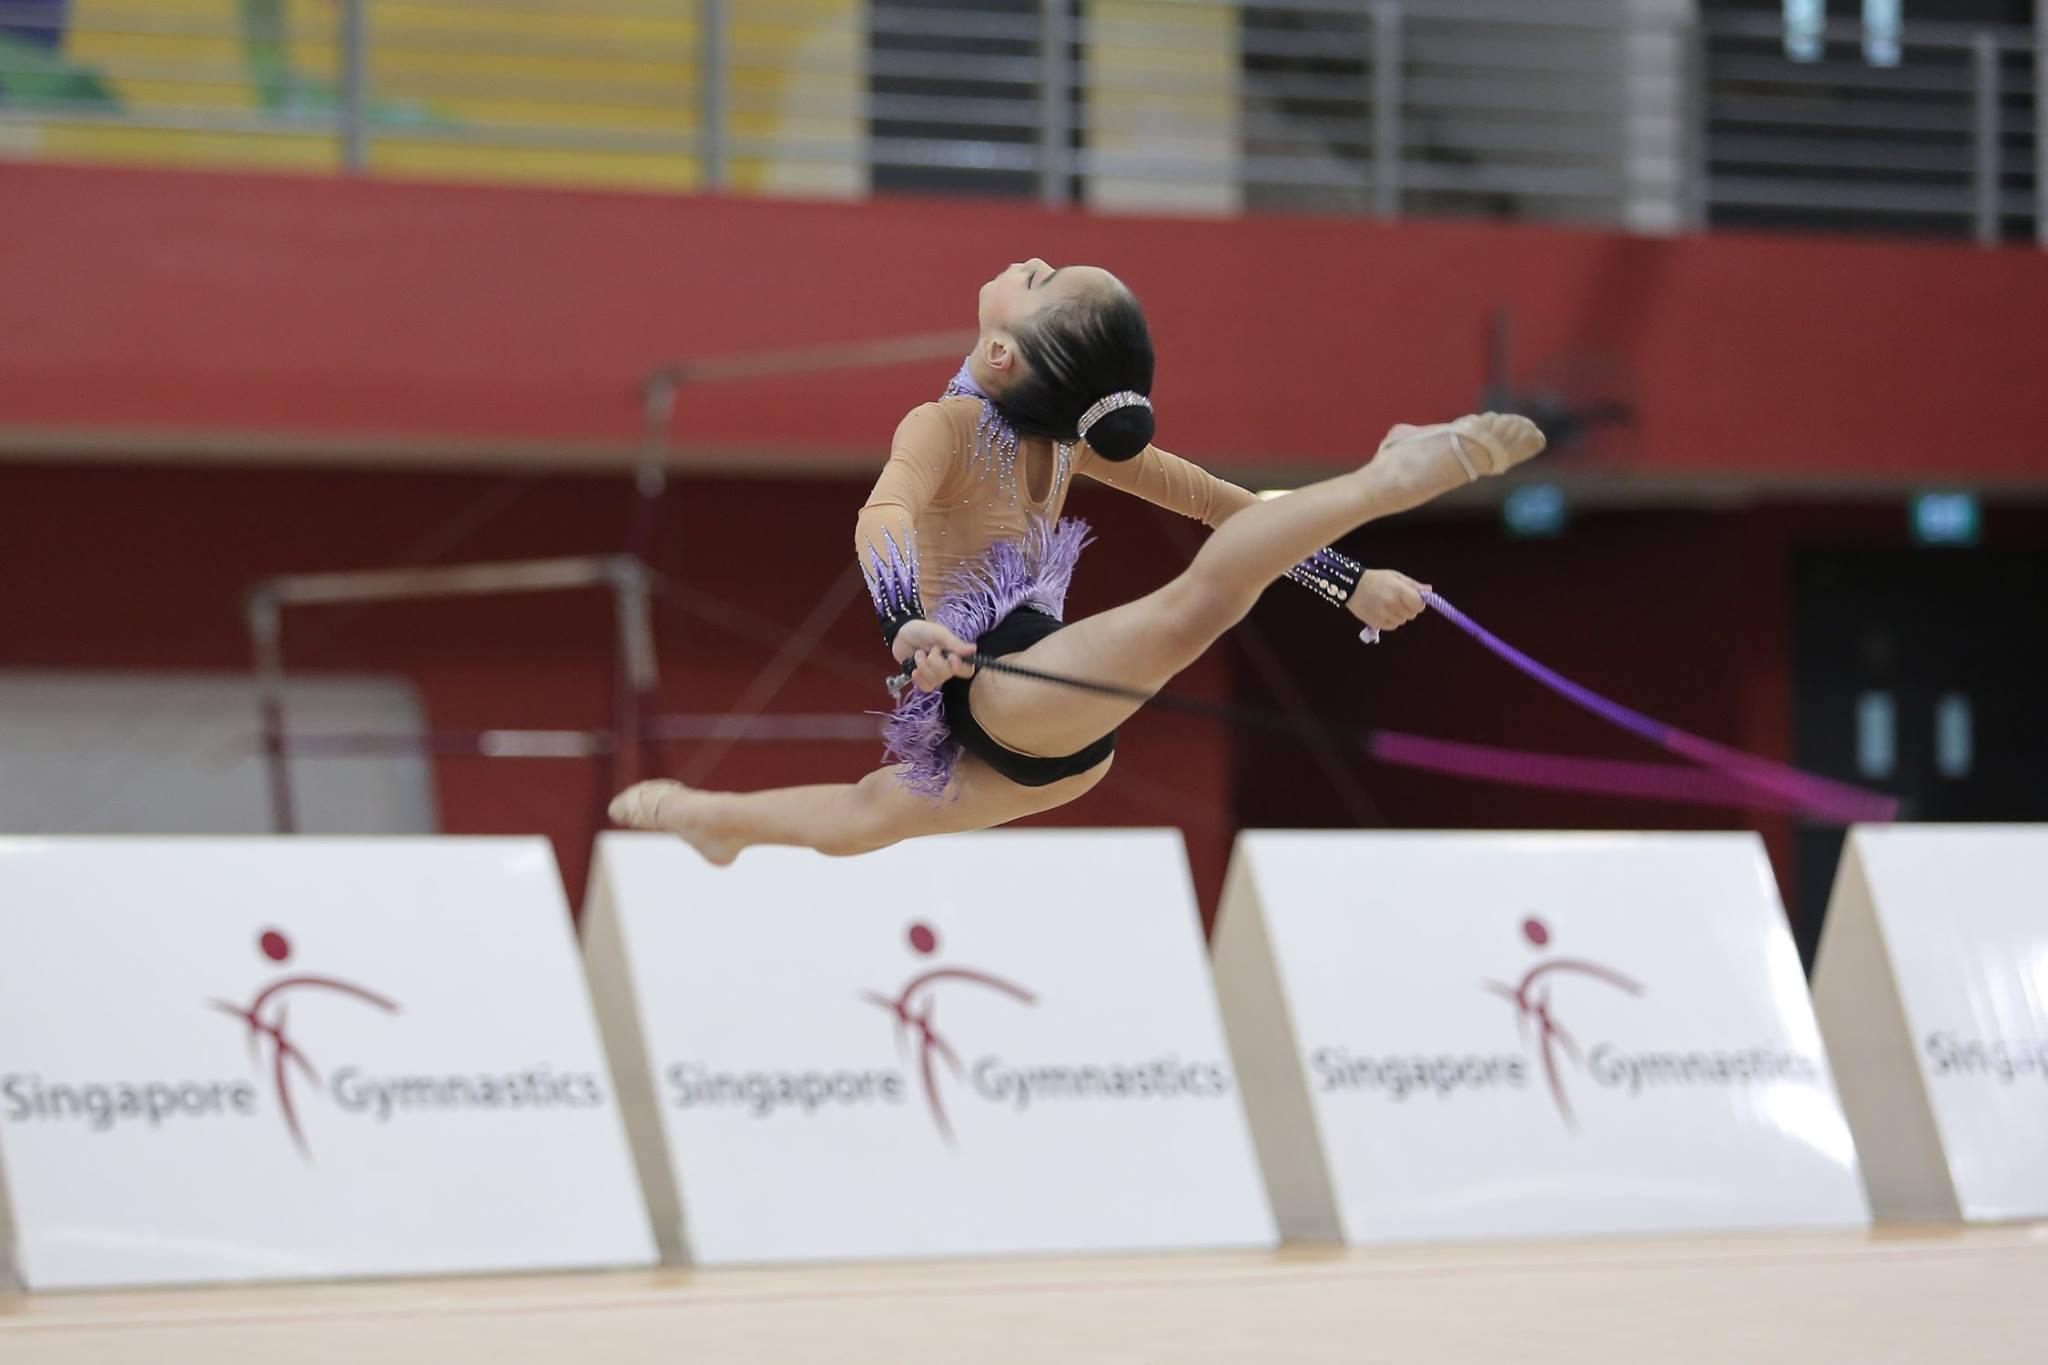 Singapore Gymnastics Open Championships 2017 27